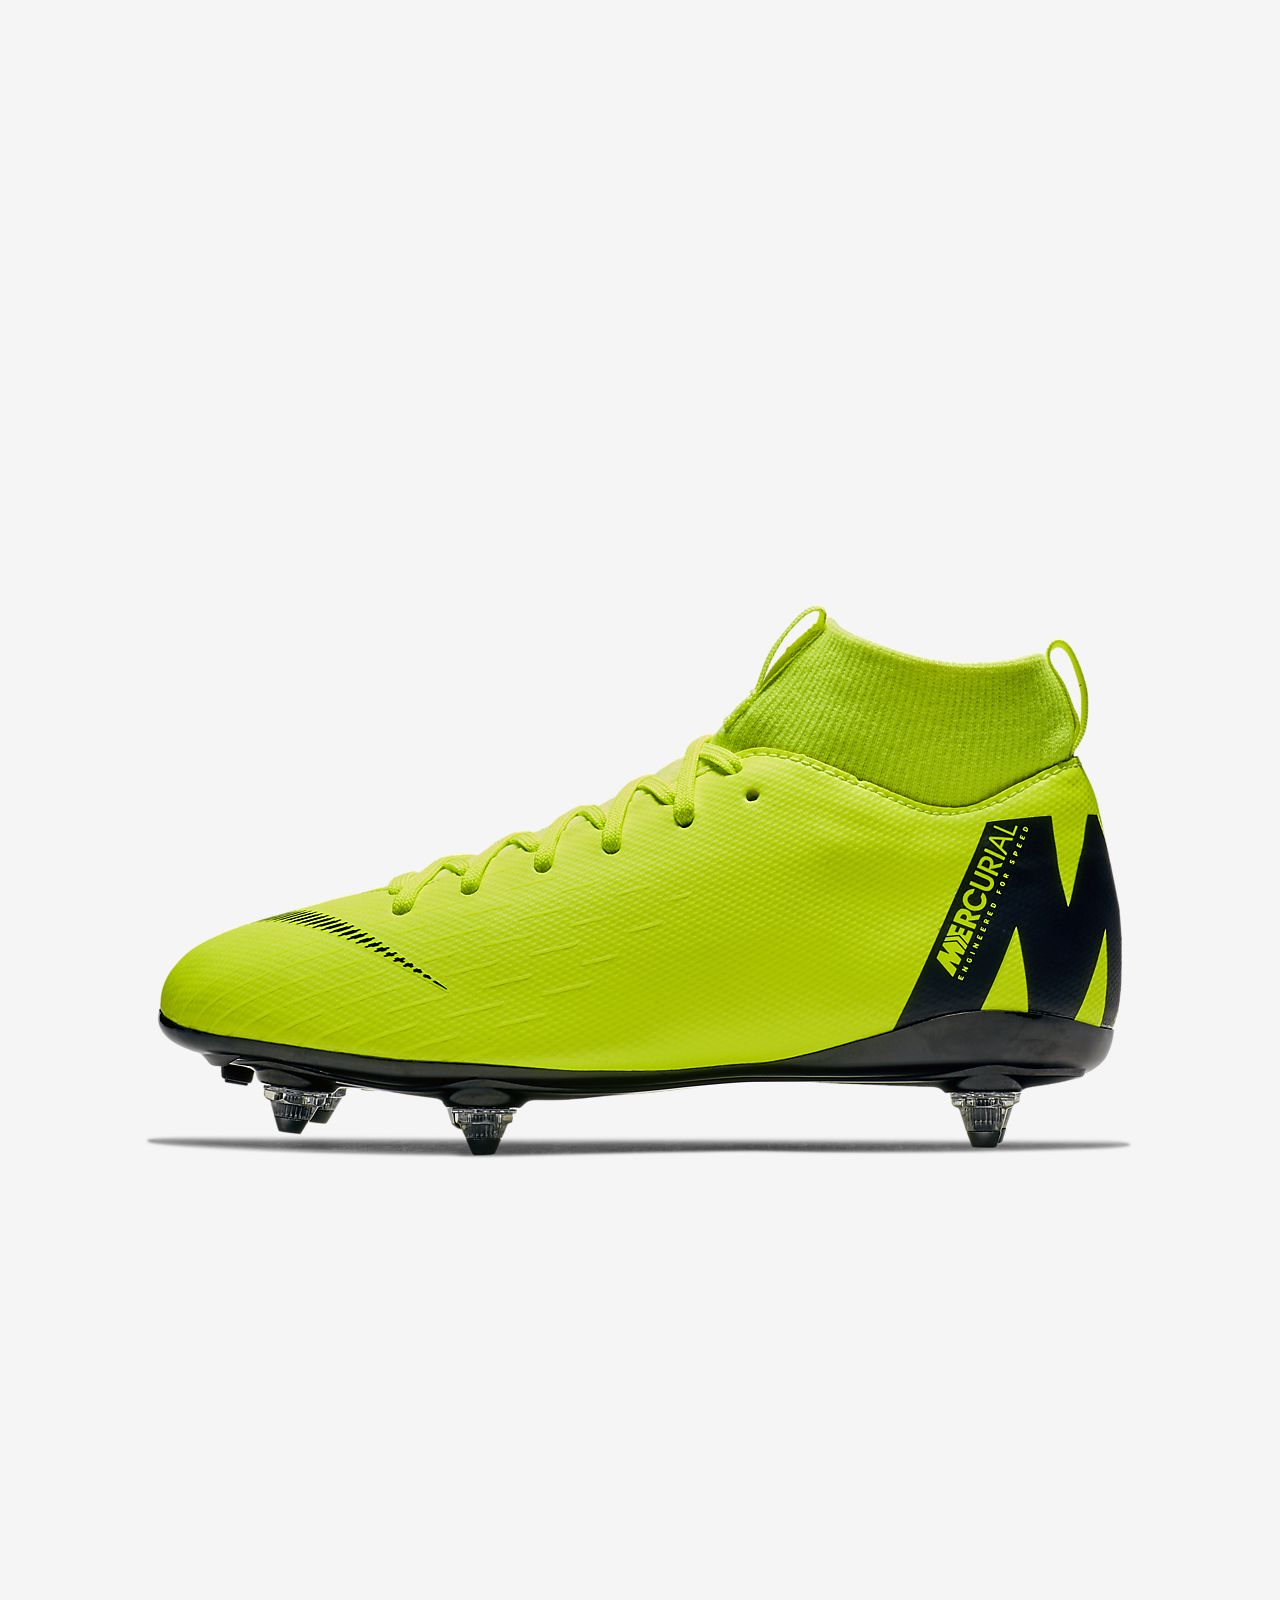 Nike Jr. Mercurial Superfly VI Academy SG-PRO Küçük/Genç Çocuk Yumuşak Zemin Kramponu